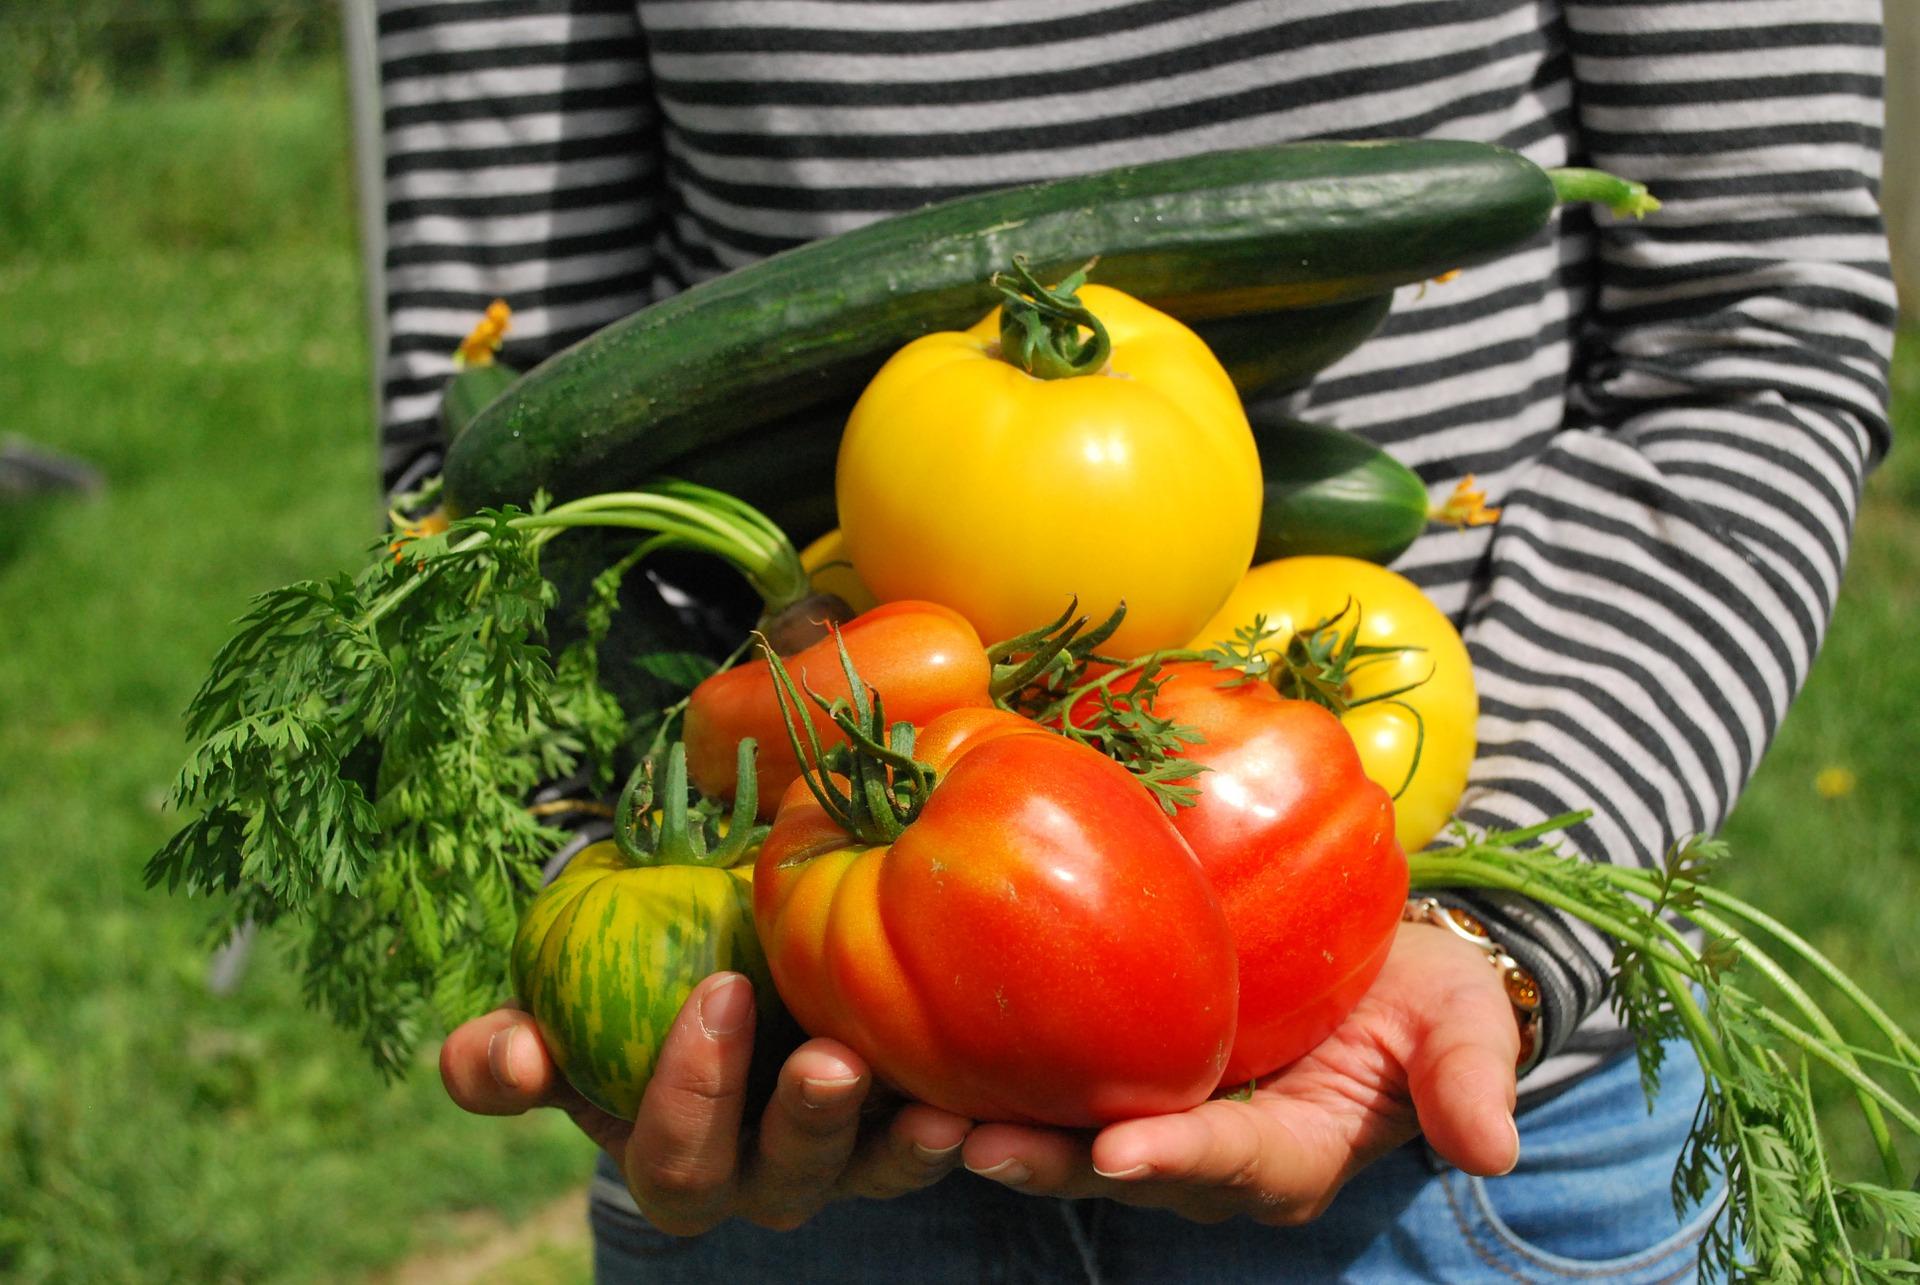 vegetables-742095_1920.jpg